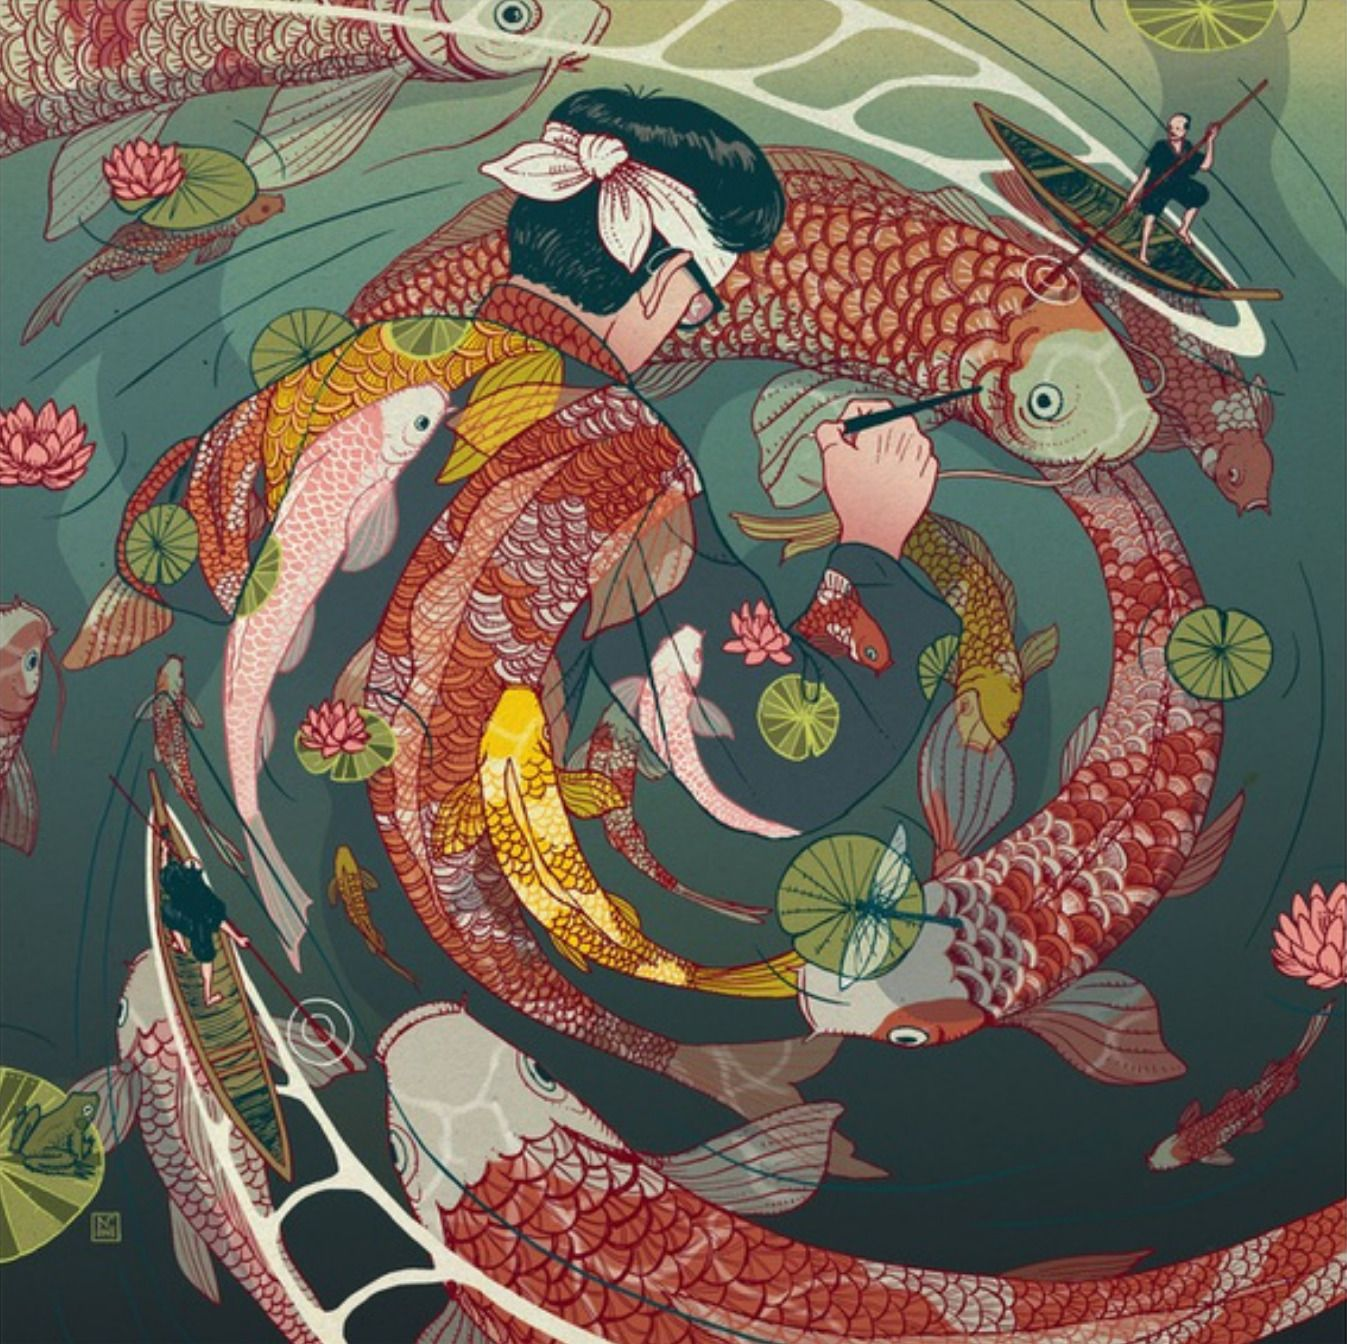 Japanese Koi Fish Art Ukiyo E Tale The Creative Circle By Nicolas Castell Buy The Art Print By Clicking Throug Japanese Art Composition Art Illustration Art